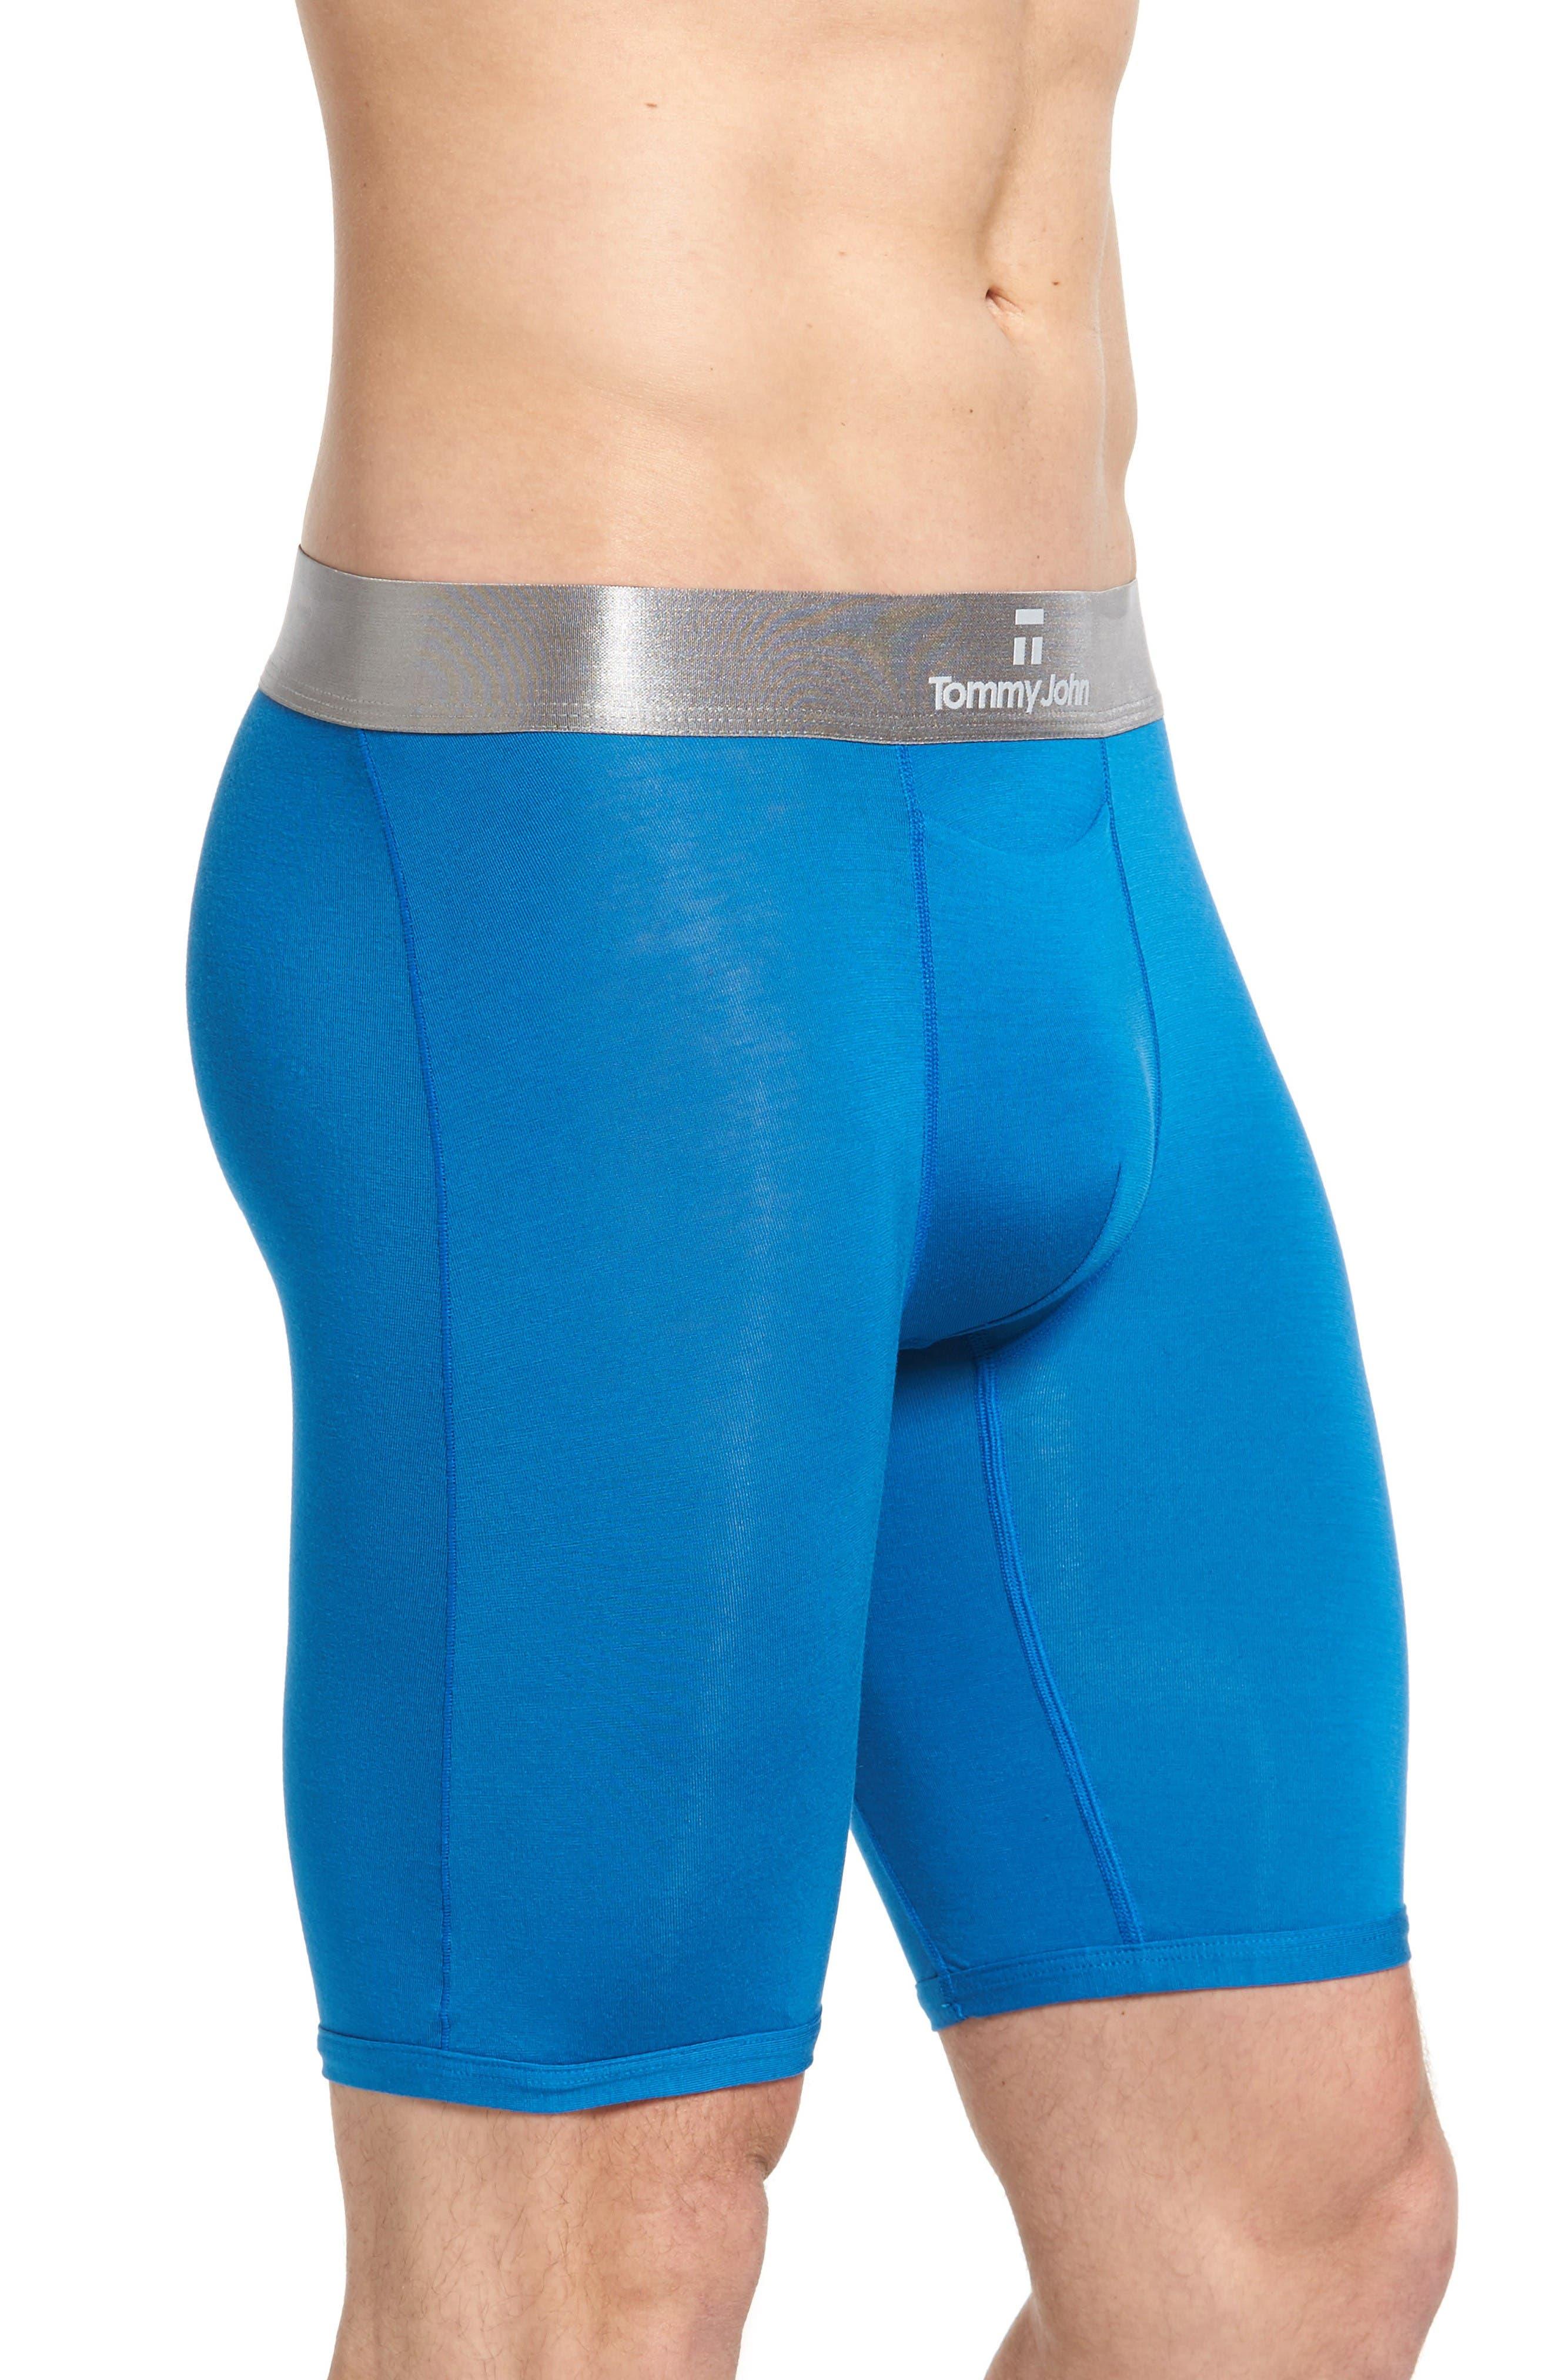 Second Skin Titanium Boxer Briefs,                             Alternate thumbnail 3, color,                             Imperial Blue